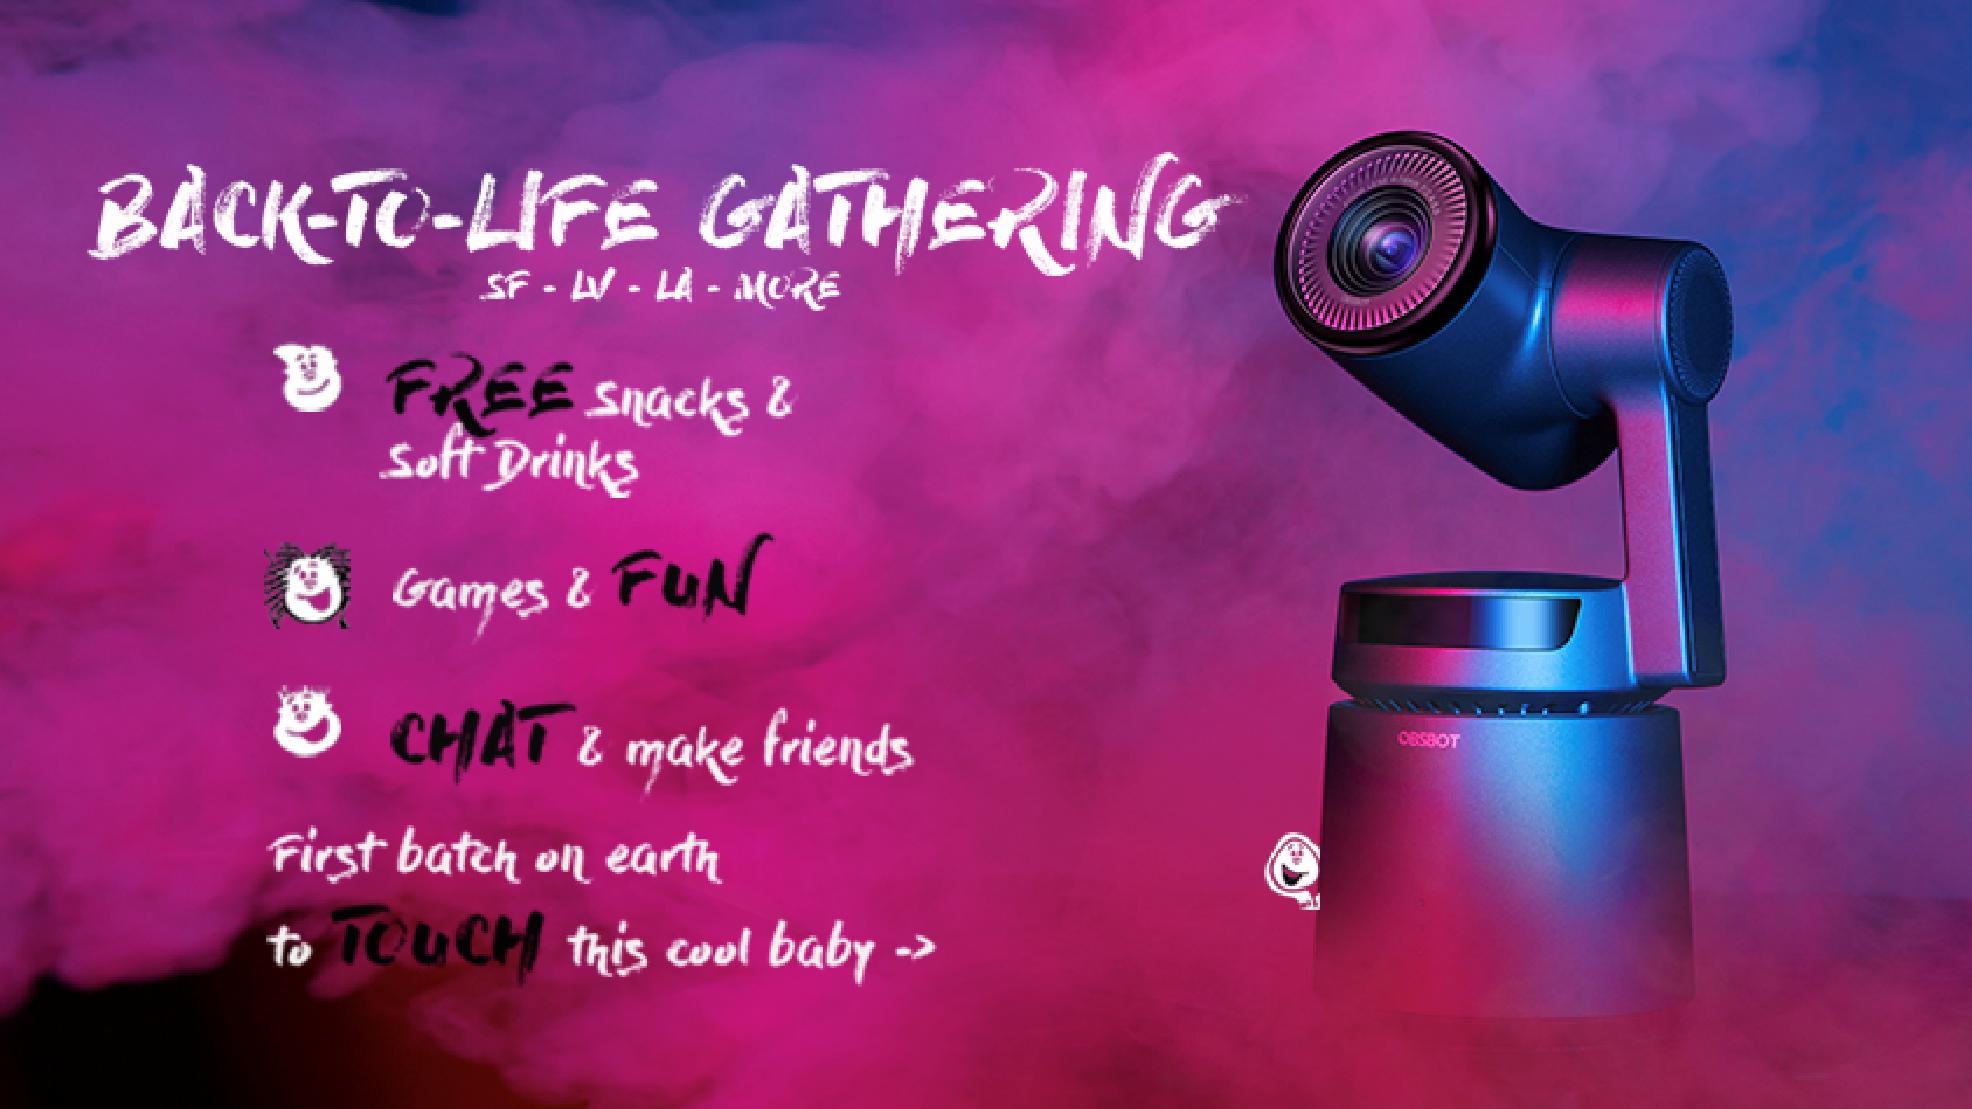 "OBSBOT ""BACK-TO-LIFE Gathering"" - AI Camera"